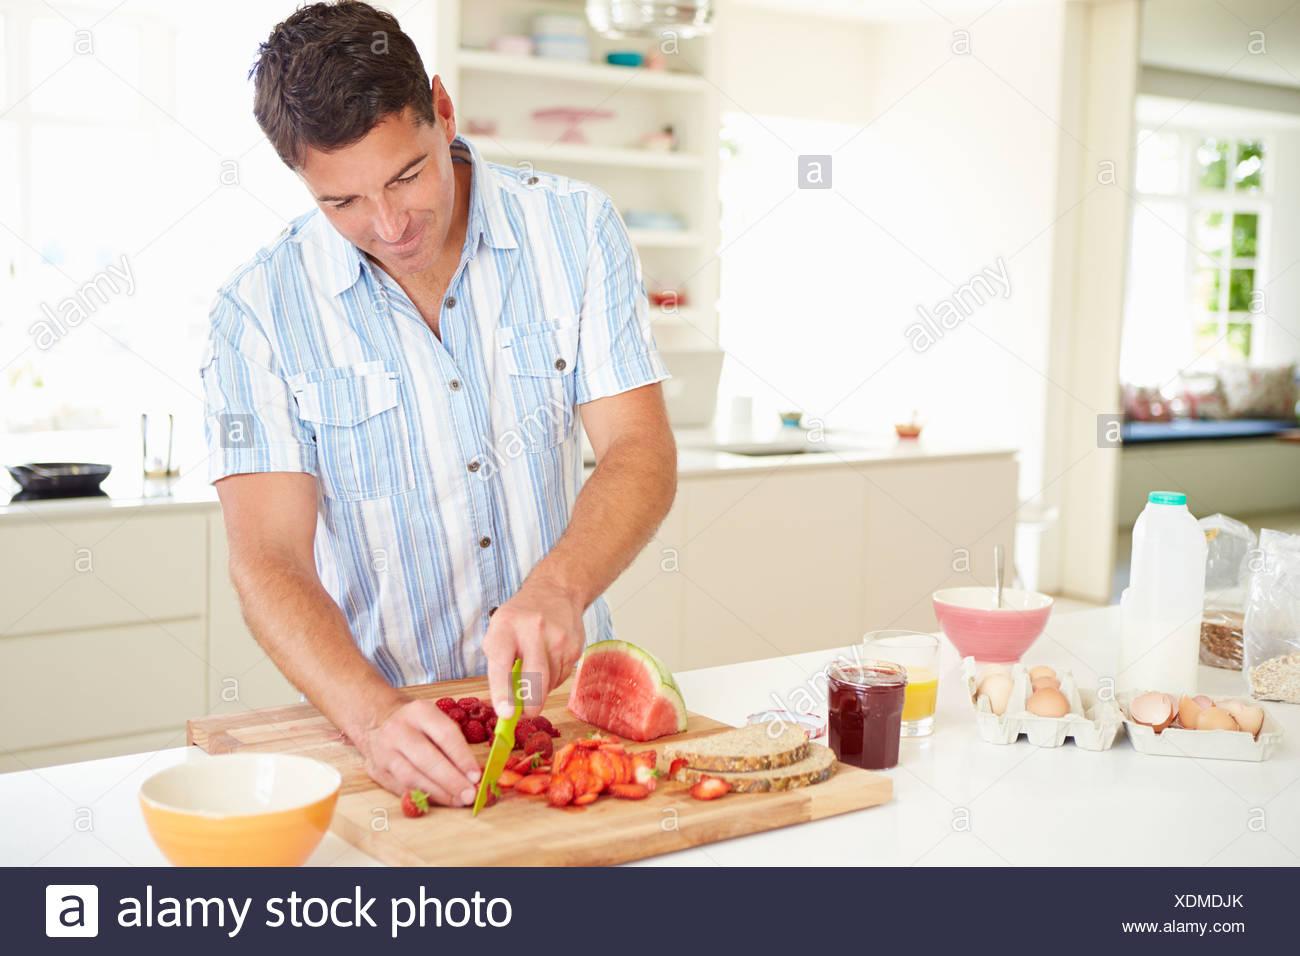 Man Preparing Healthy Breakfast In Kitchen - Stock Image